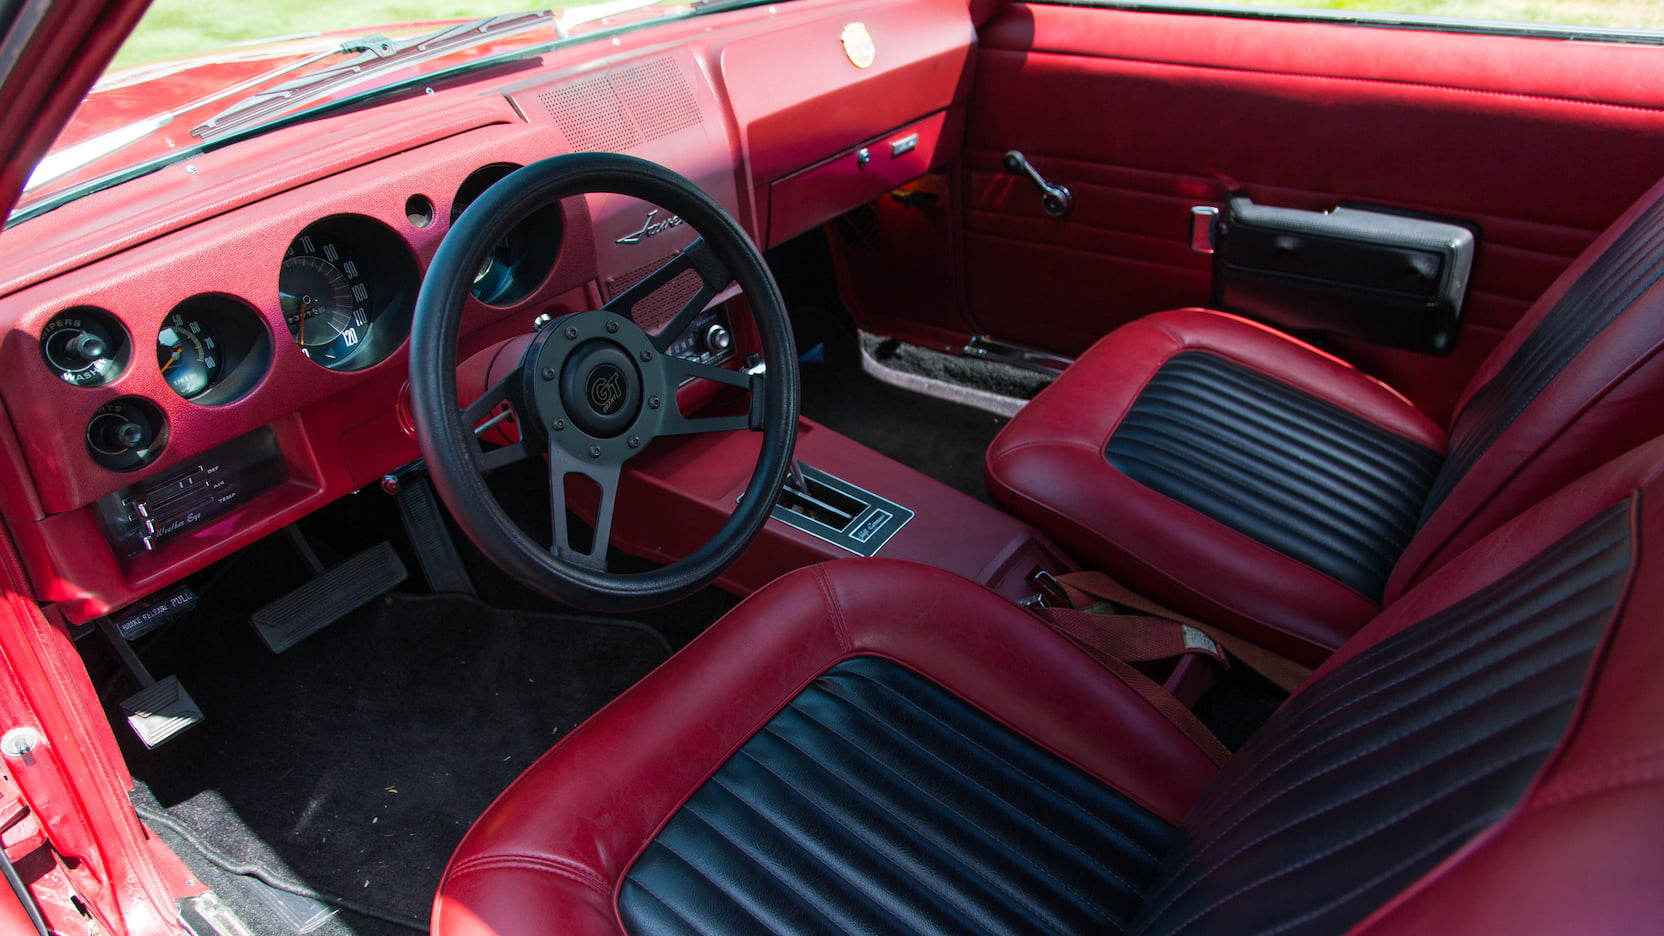 1968 AMC Javelin interior